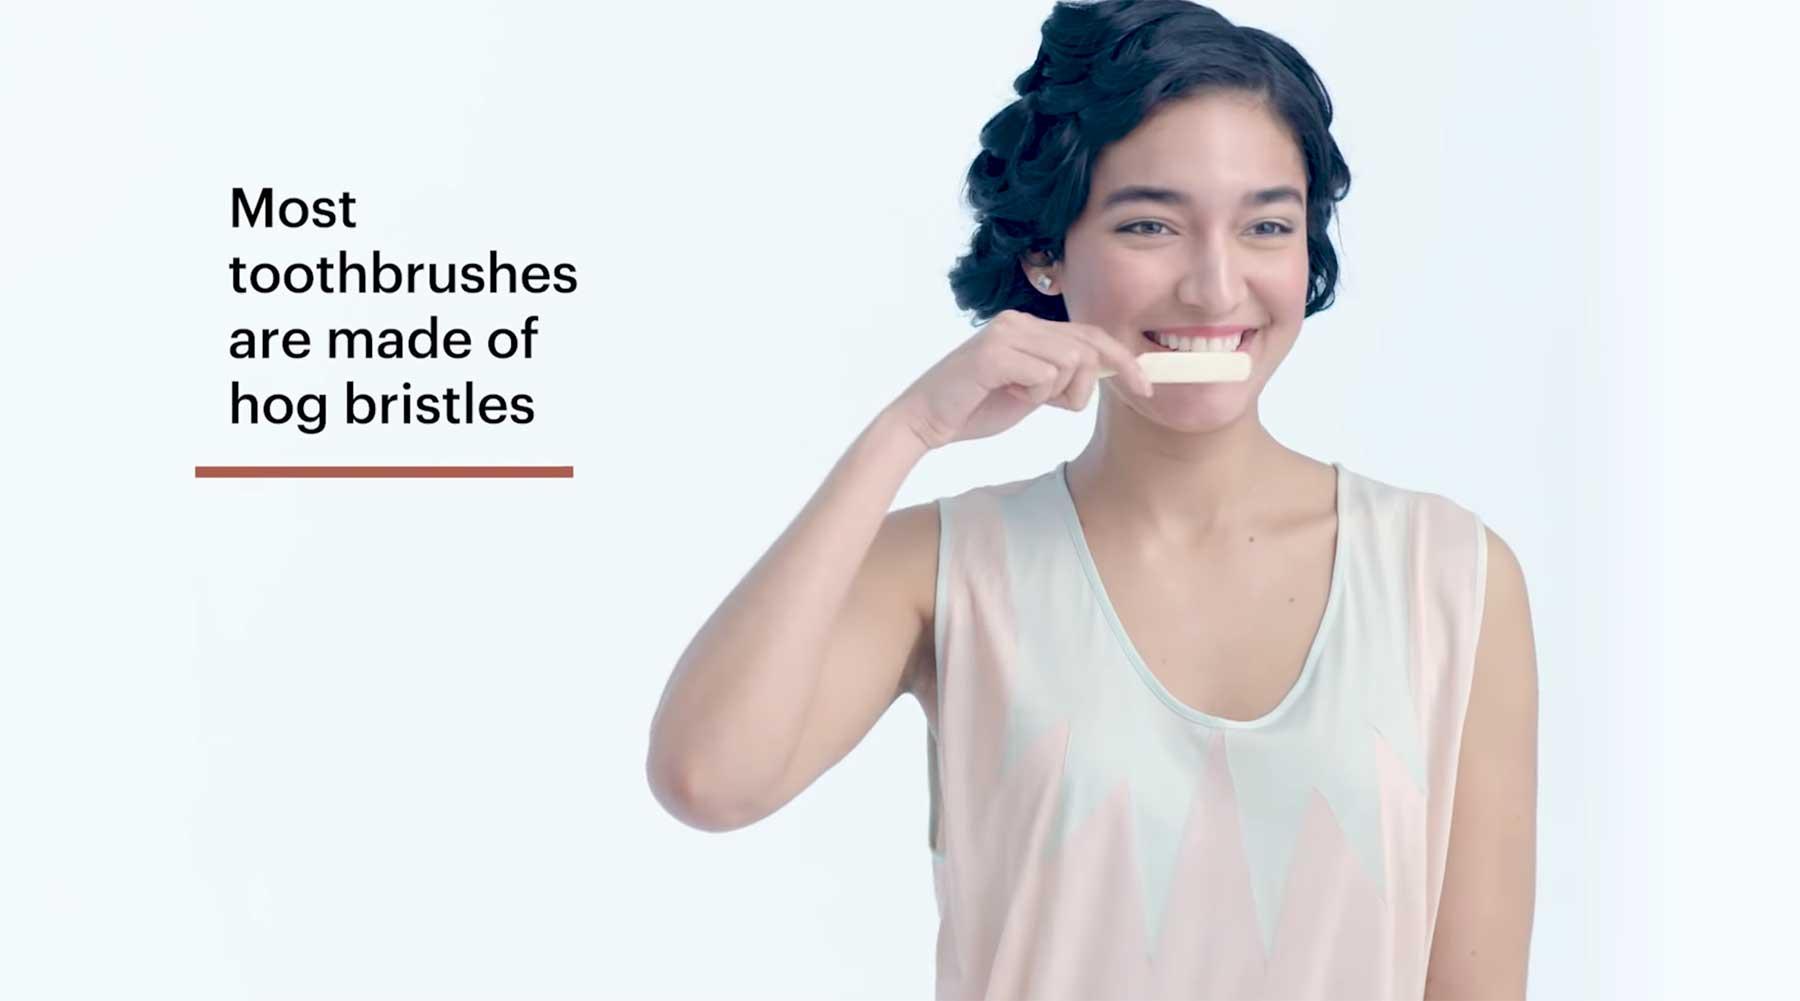 100 Jahre Zahnpflege